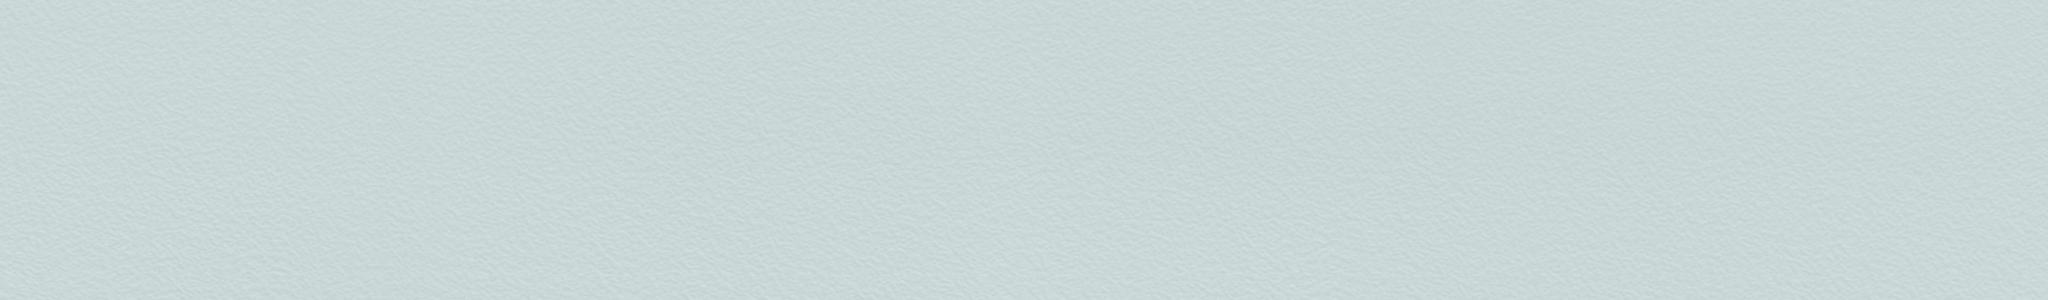 HU 168505 ABS hrana zelená laguna perla XG